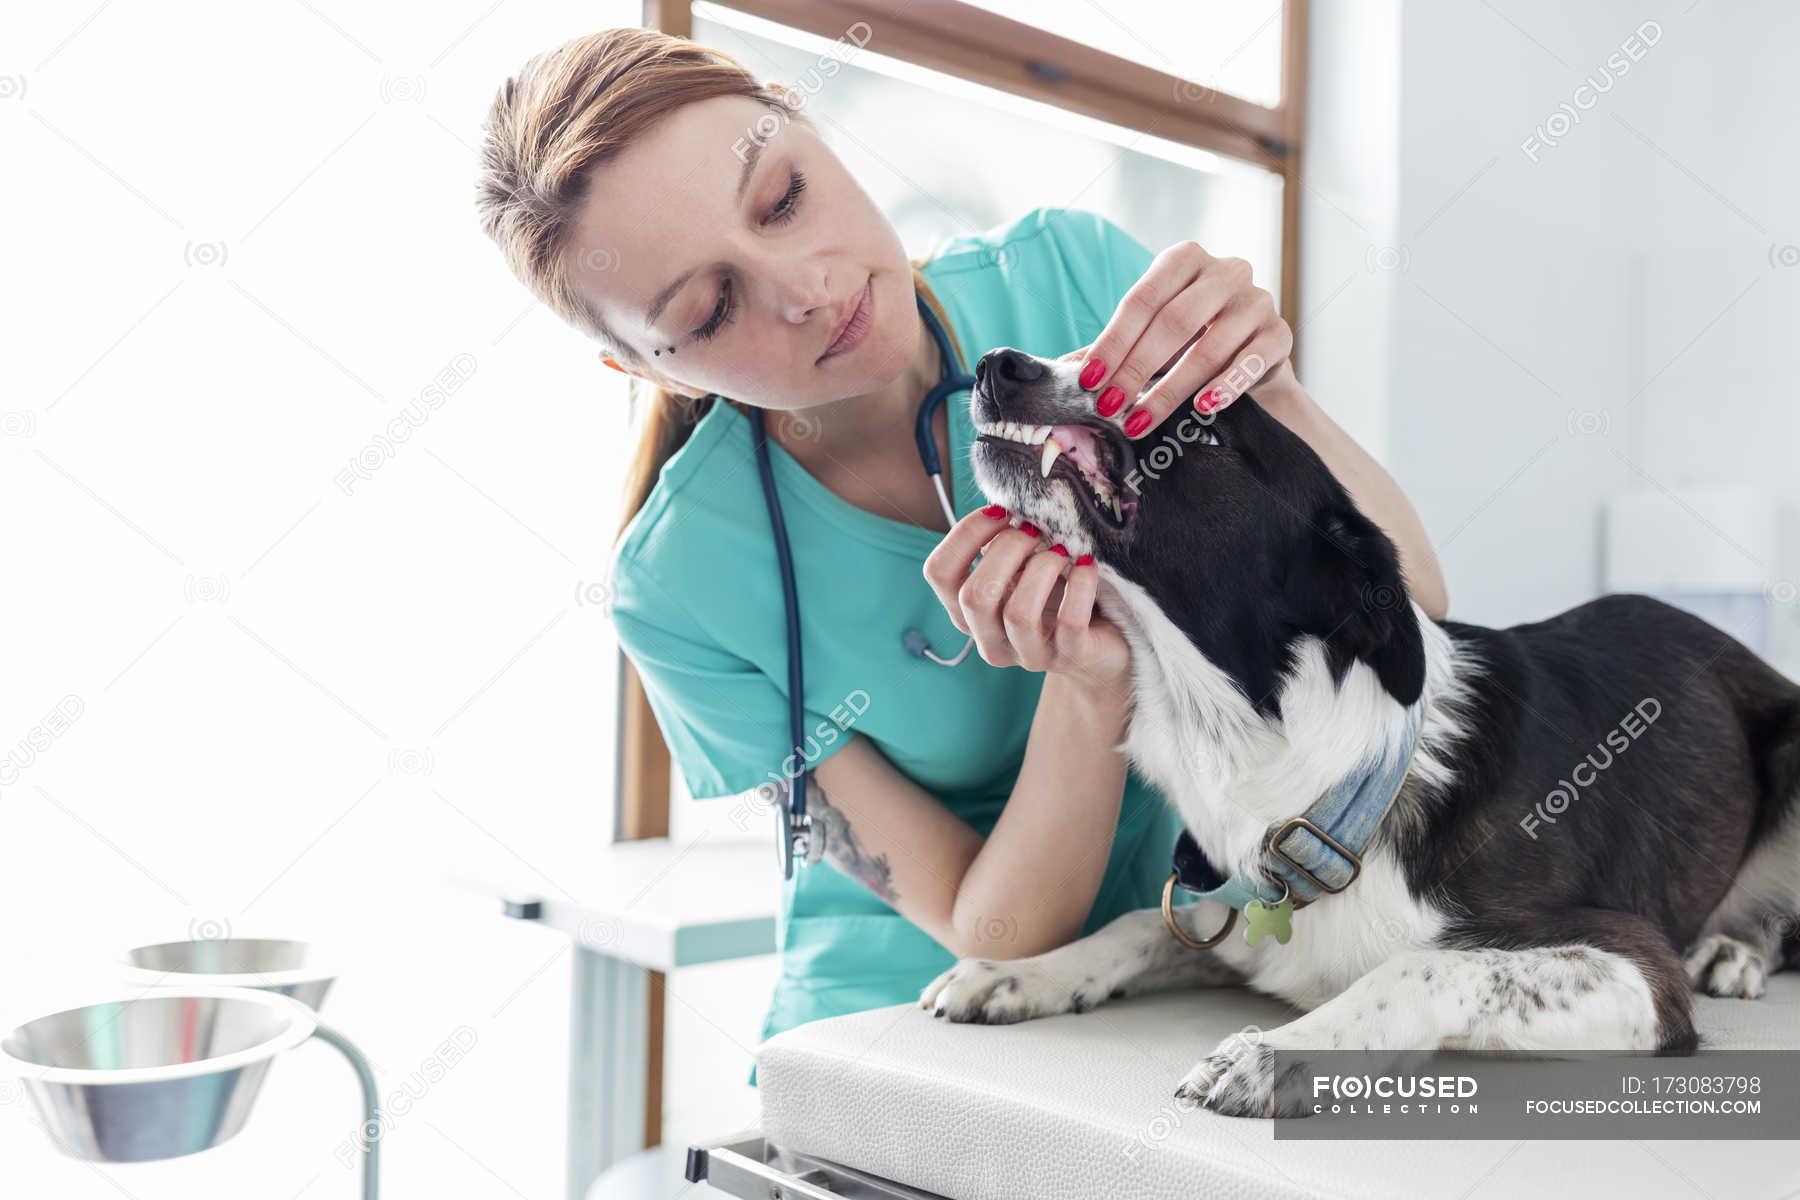 Veterinarian Assistant Examining Dog In Veterinary Clinic Stock